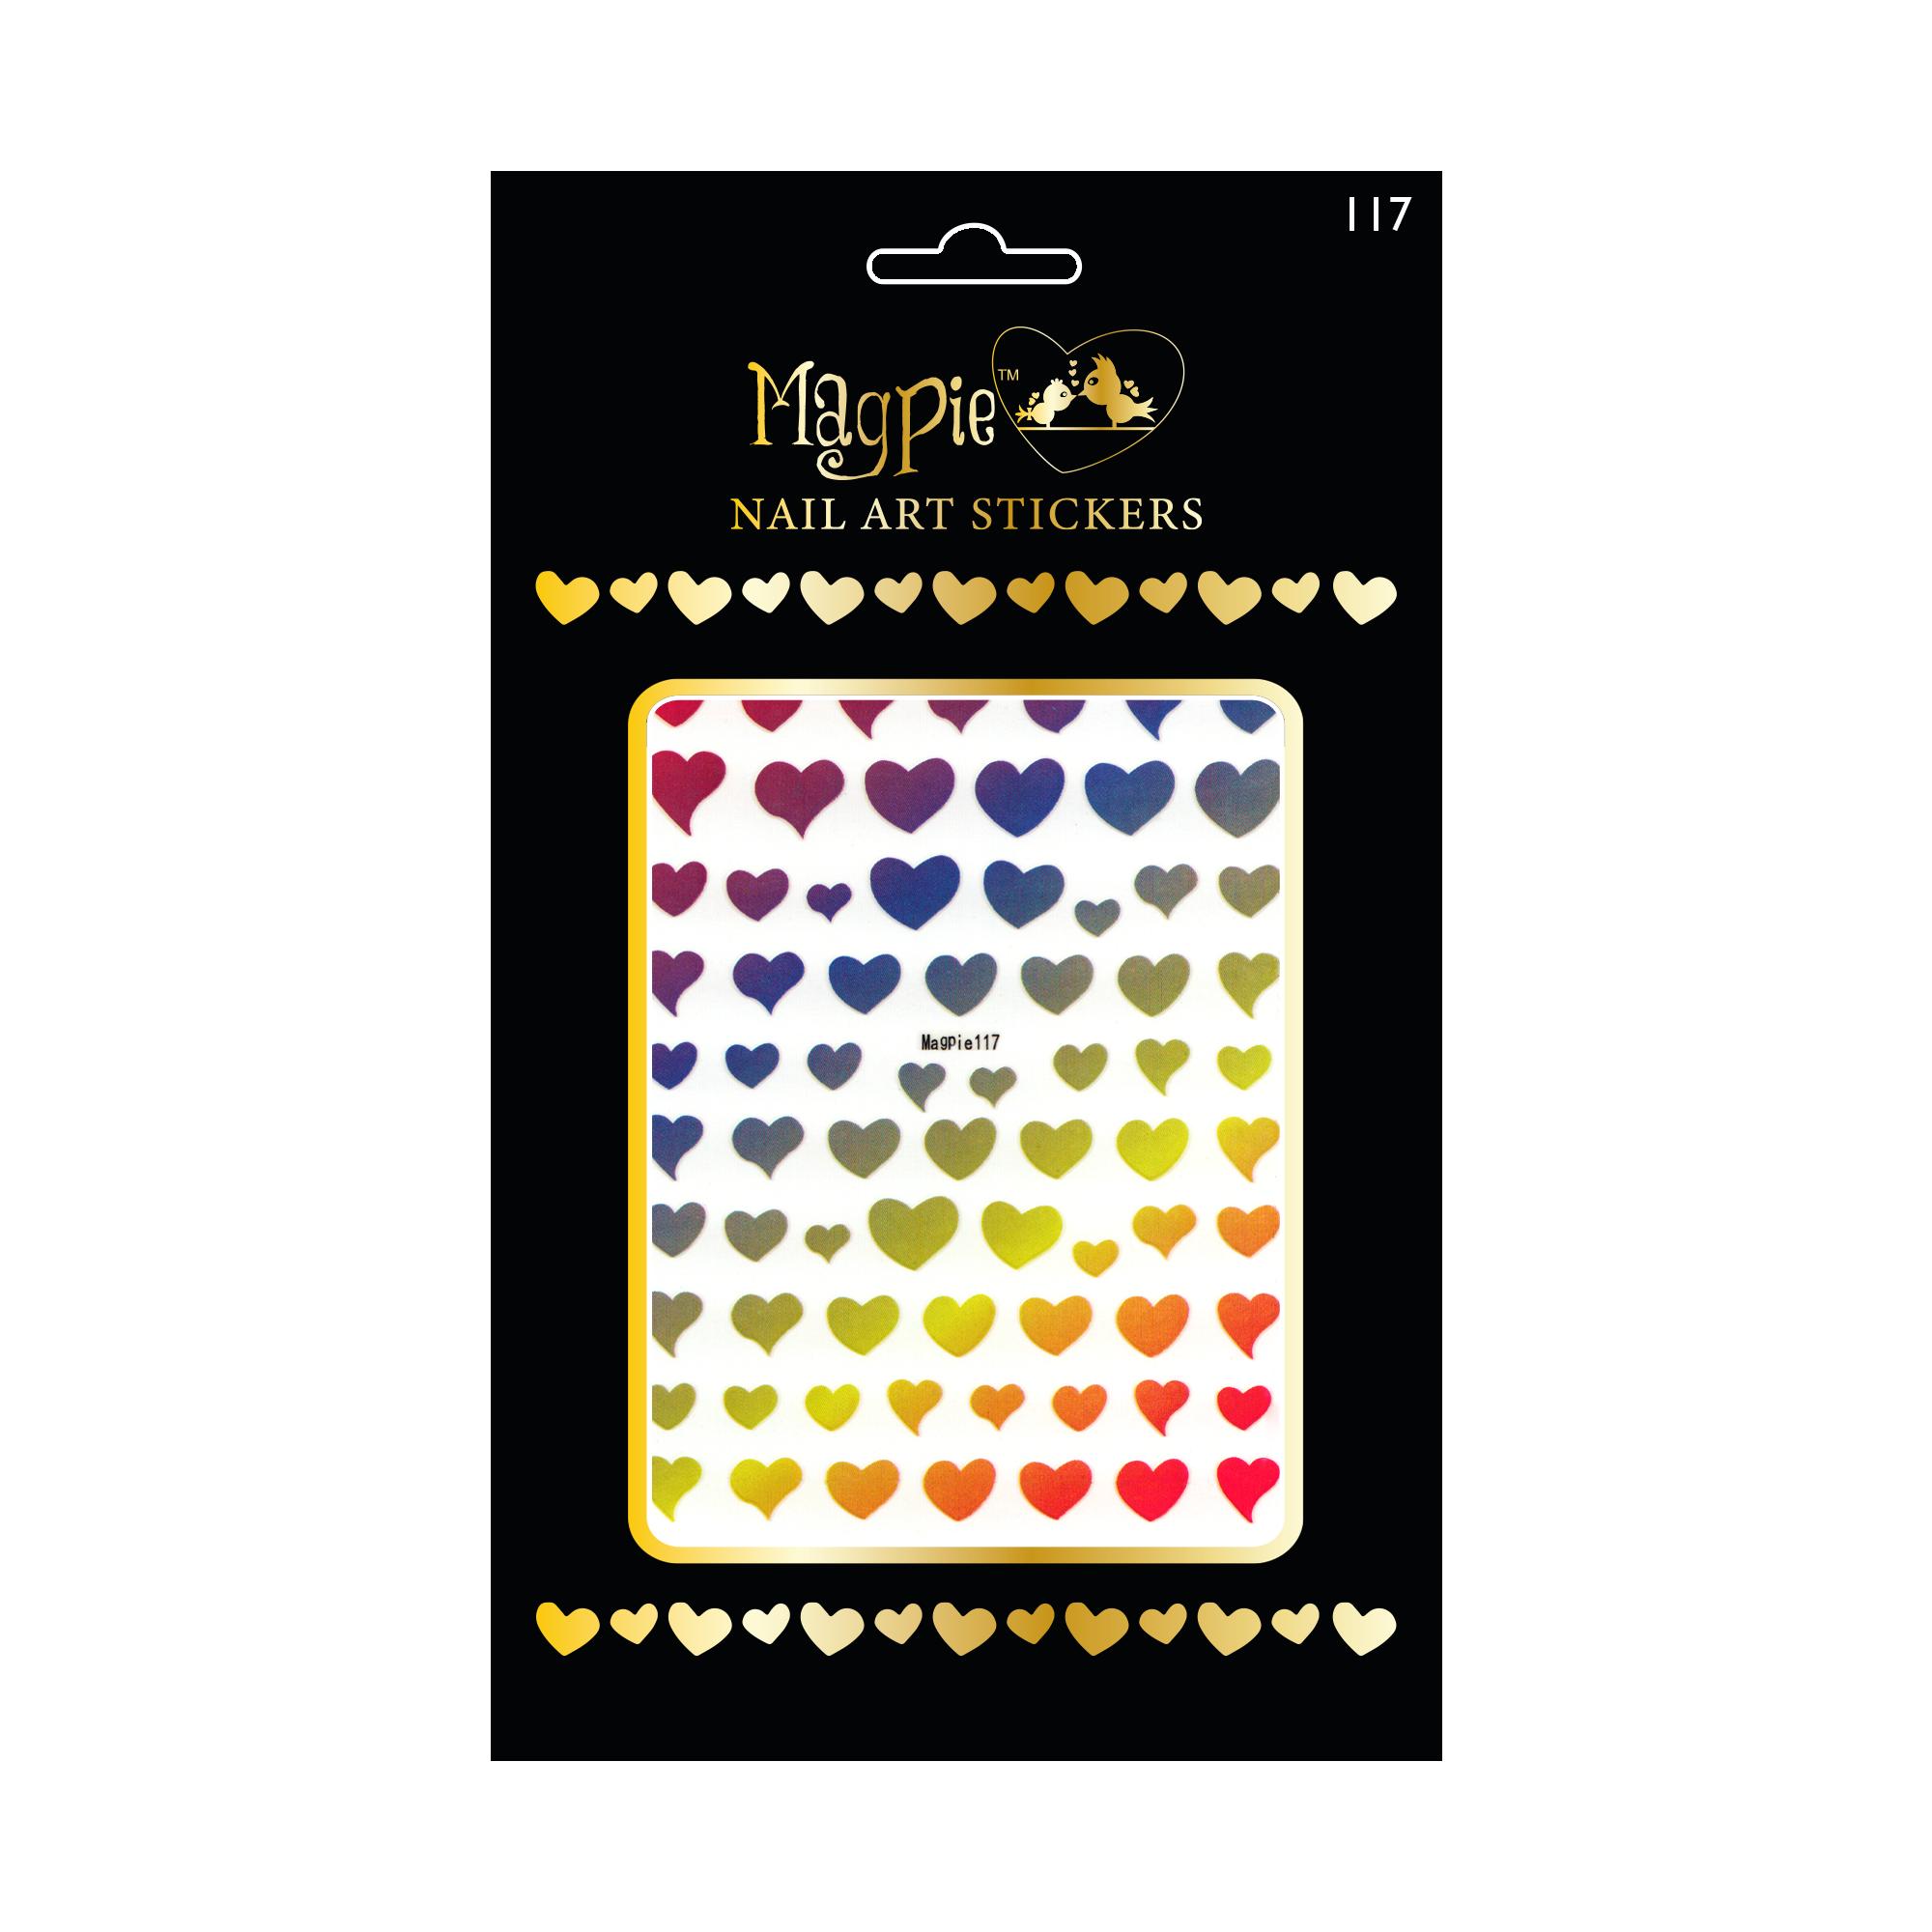 Magpie 117 stickers